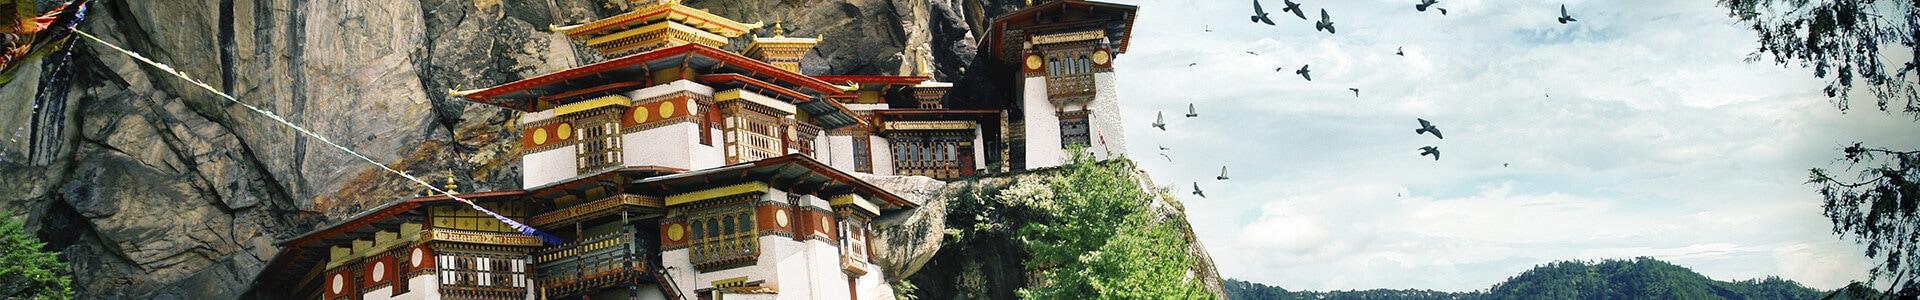 Voyage au Bhoutan - TUI